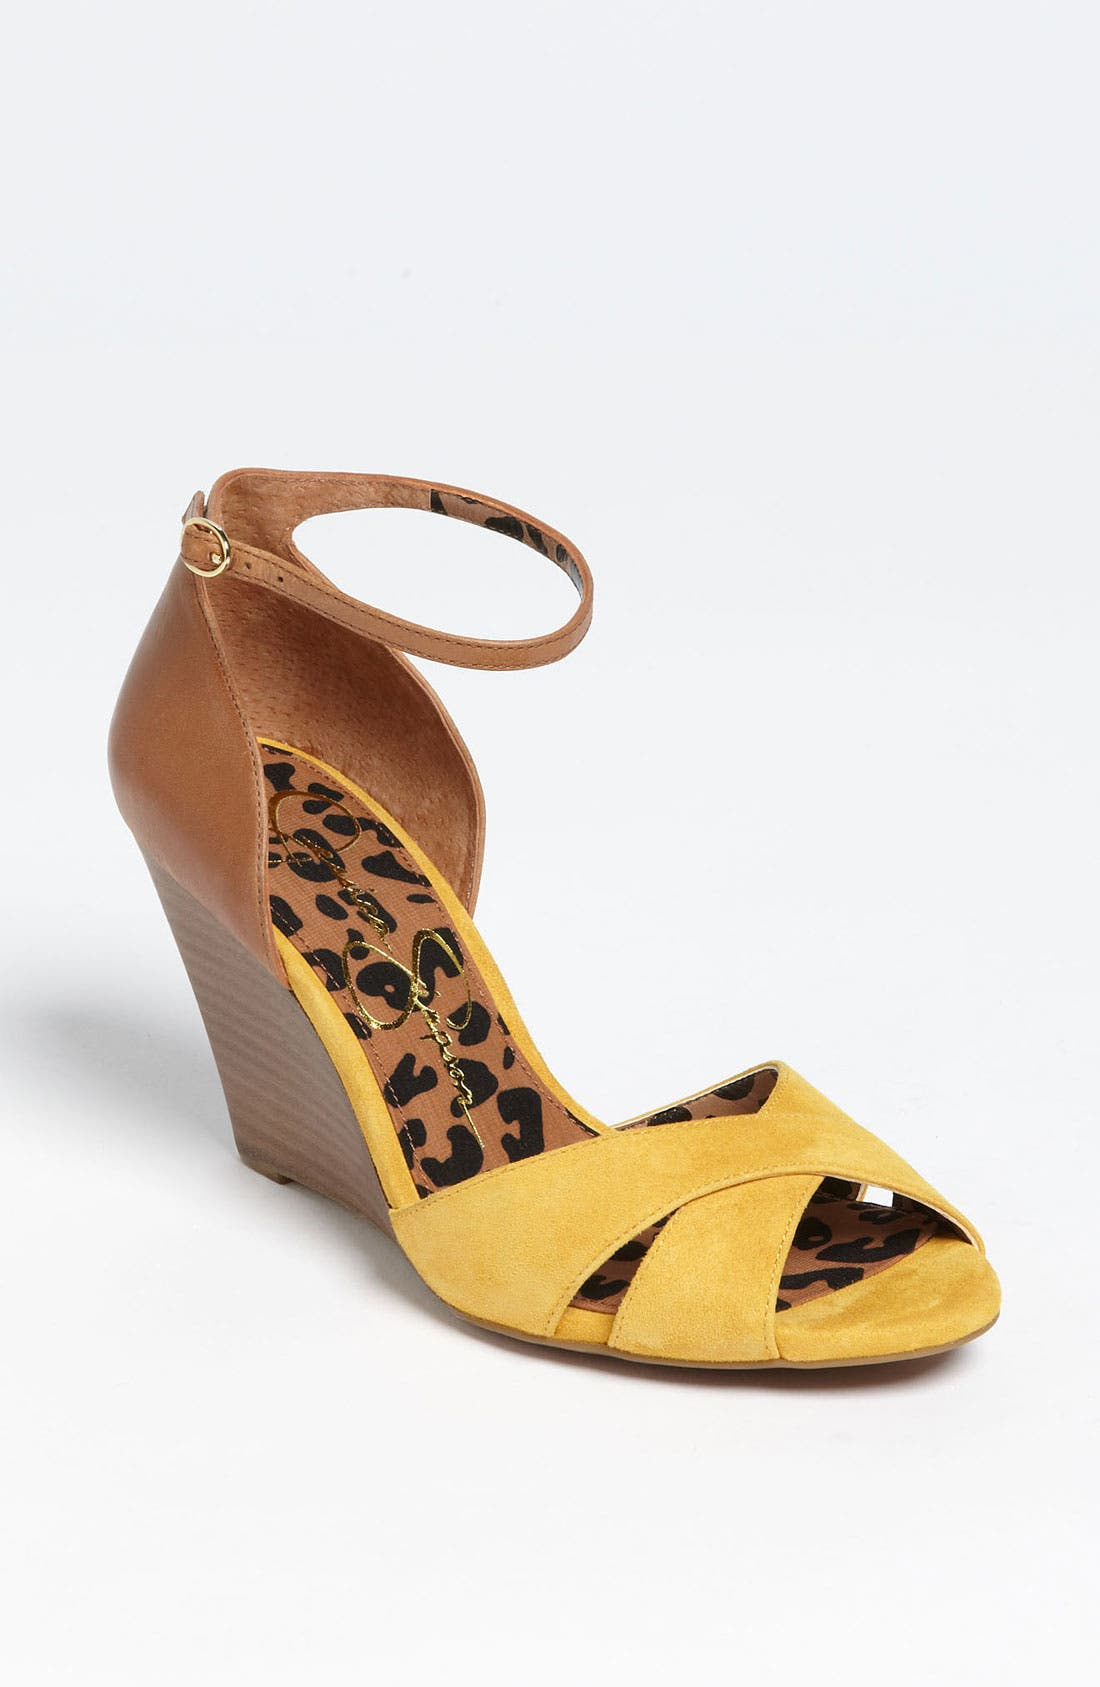 Alternate Image 1 Selected - Jessica Simpson 'Nouta' Sandal